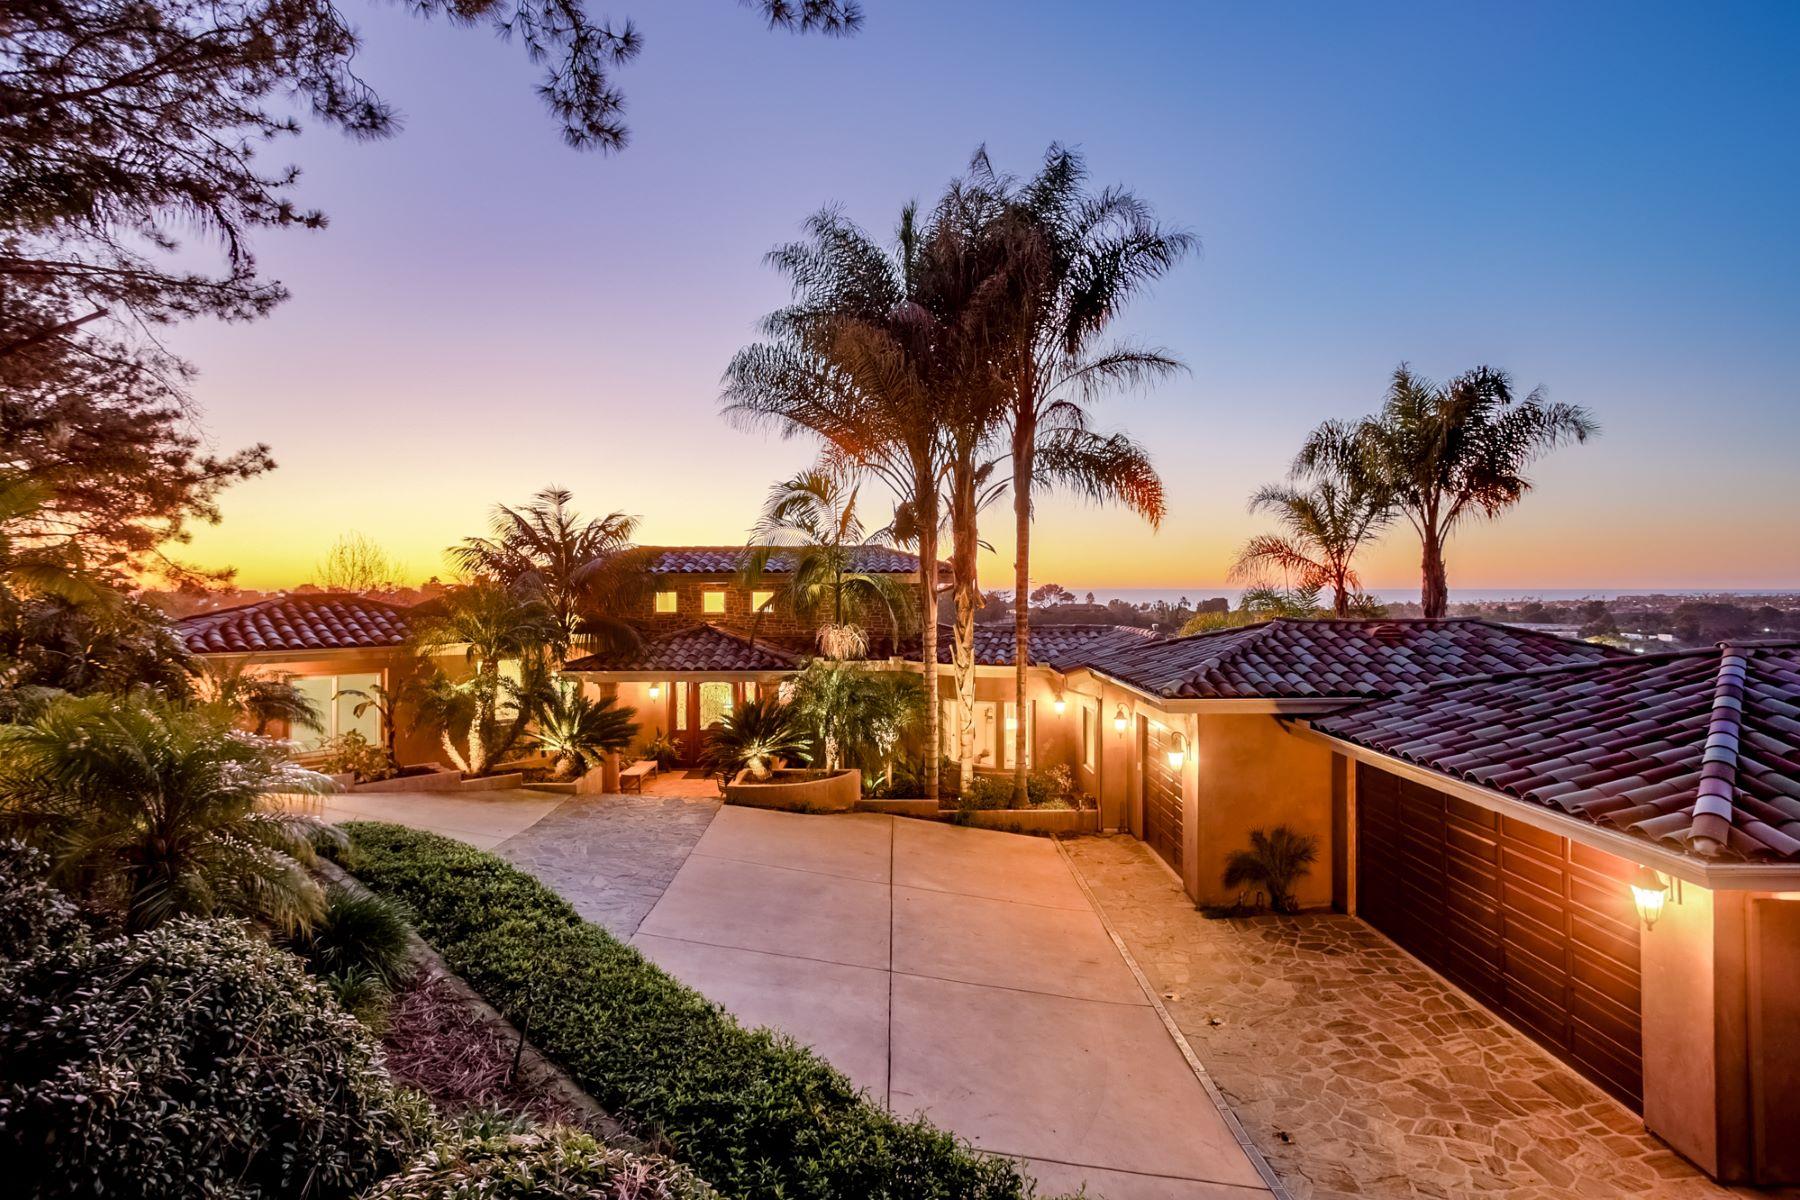 Additional photo for property listing at 1749 Noma Lane Encinitas, California 92024 United States